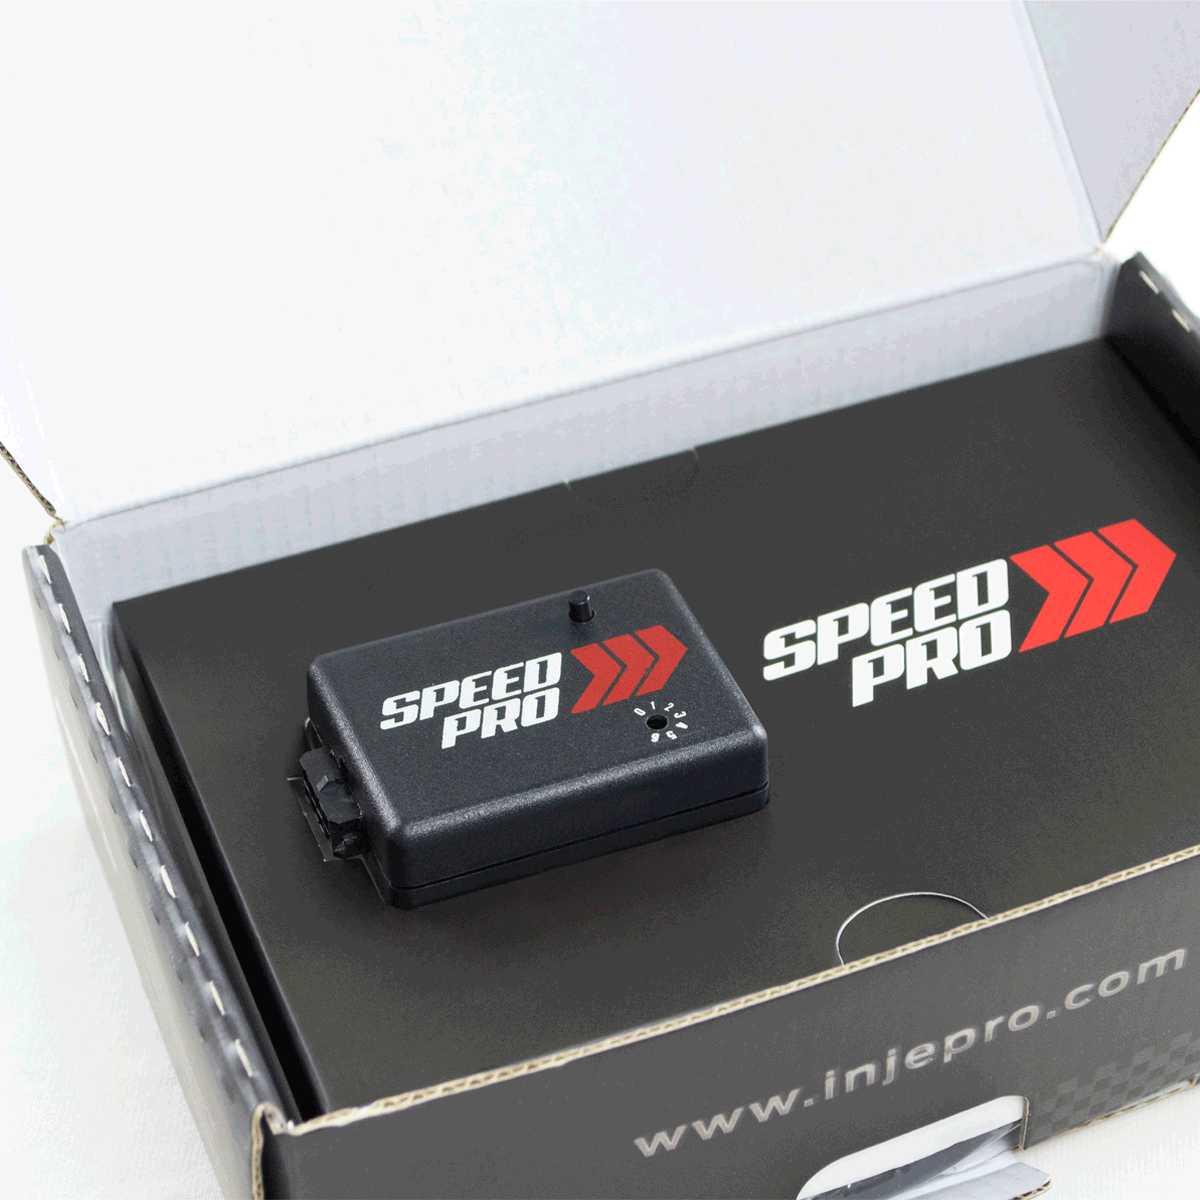 Chip De Potência Para Pedal Speedpro Para Toyota Hilux